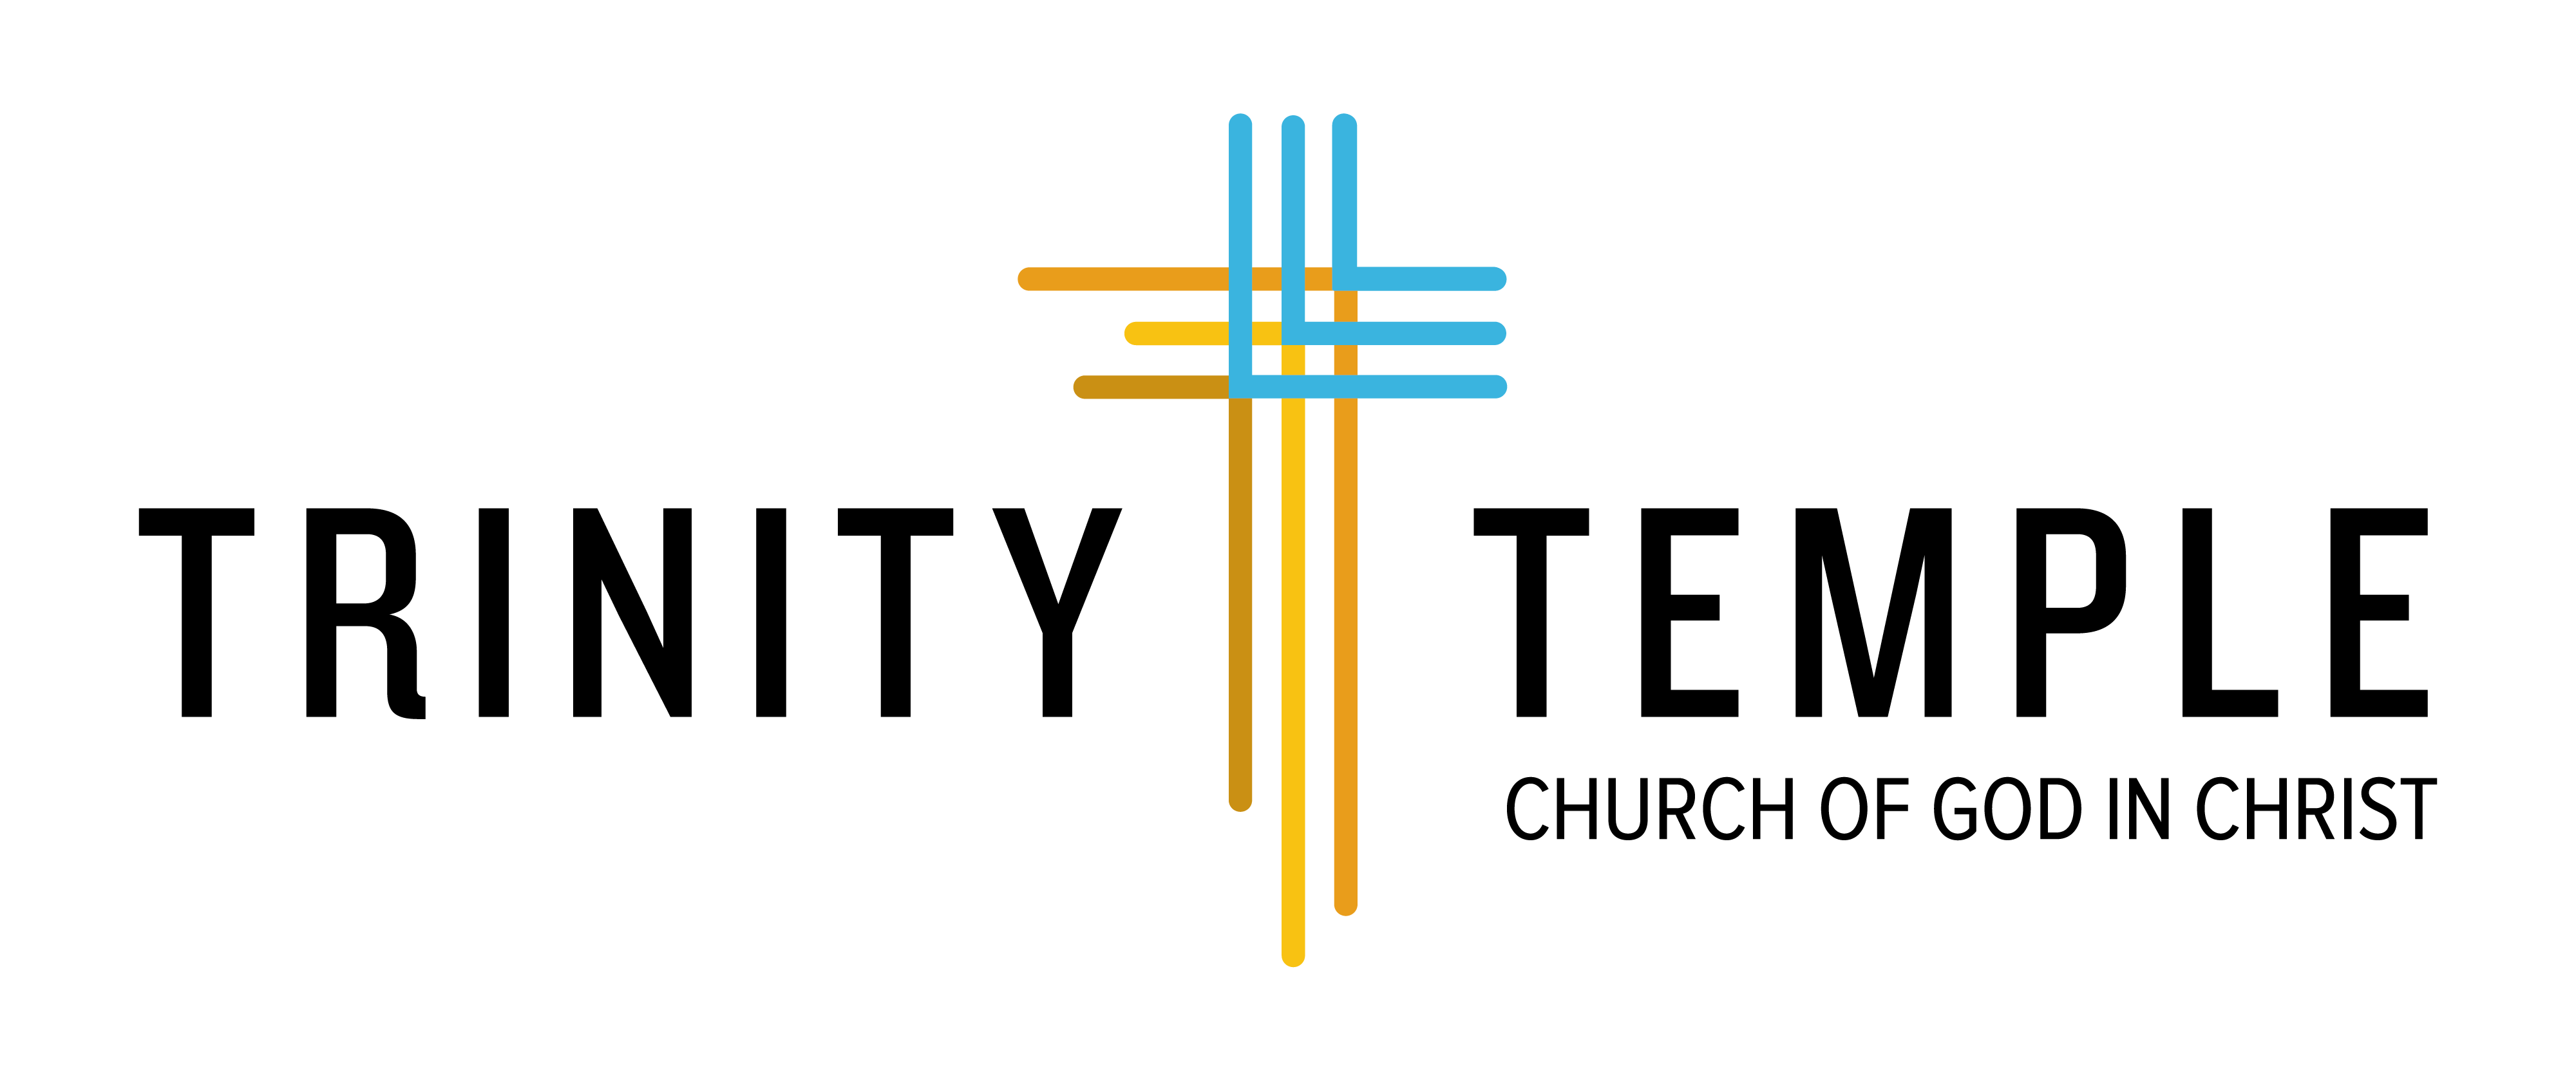 trinitytemple.org